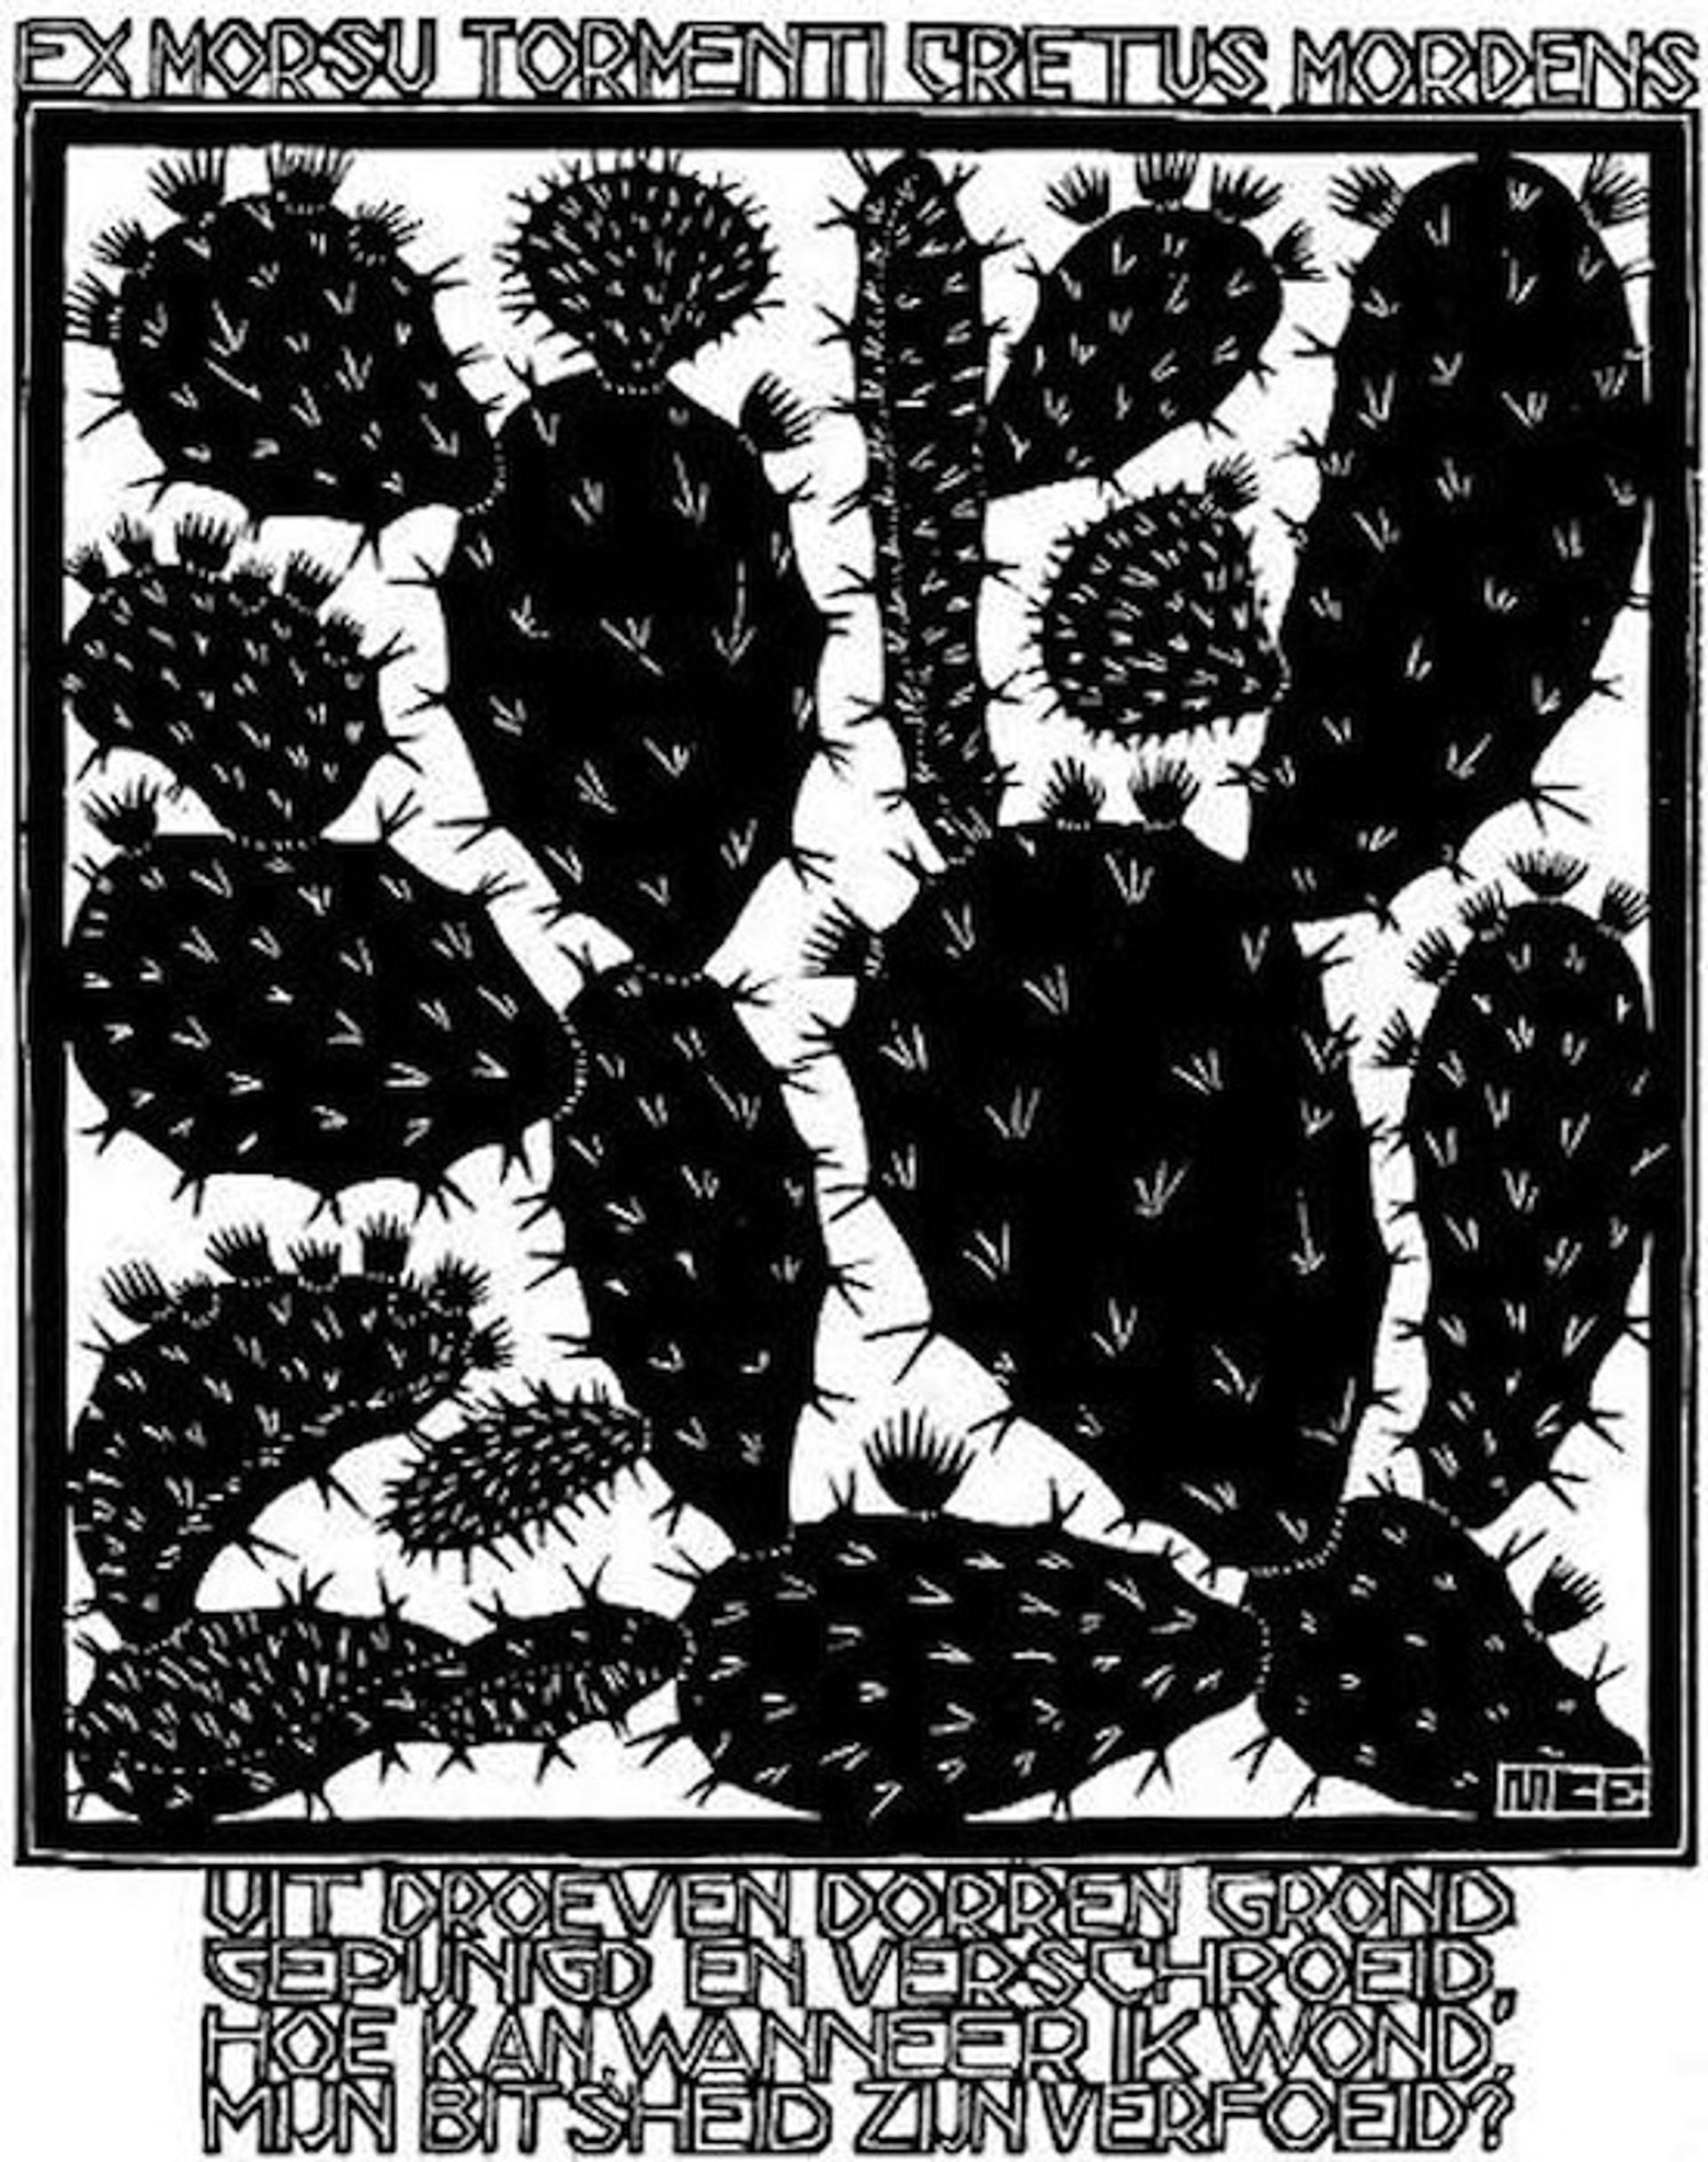 Emblemata - Cactus by M.C. Escher